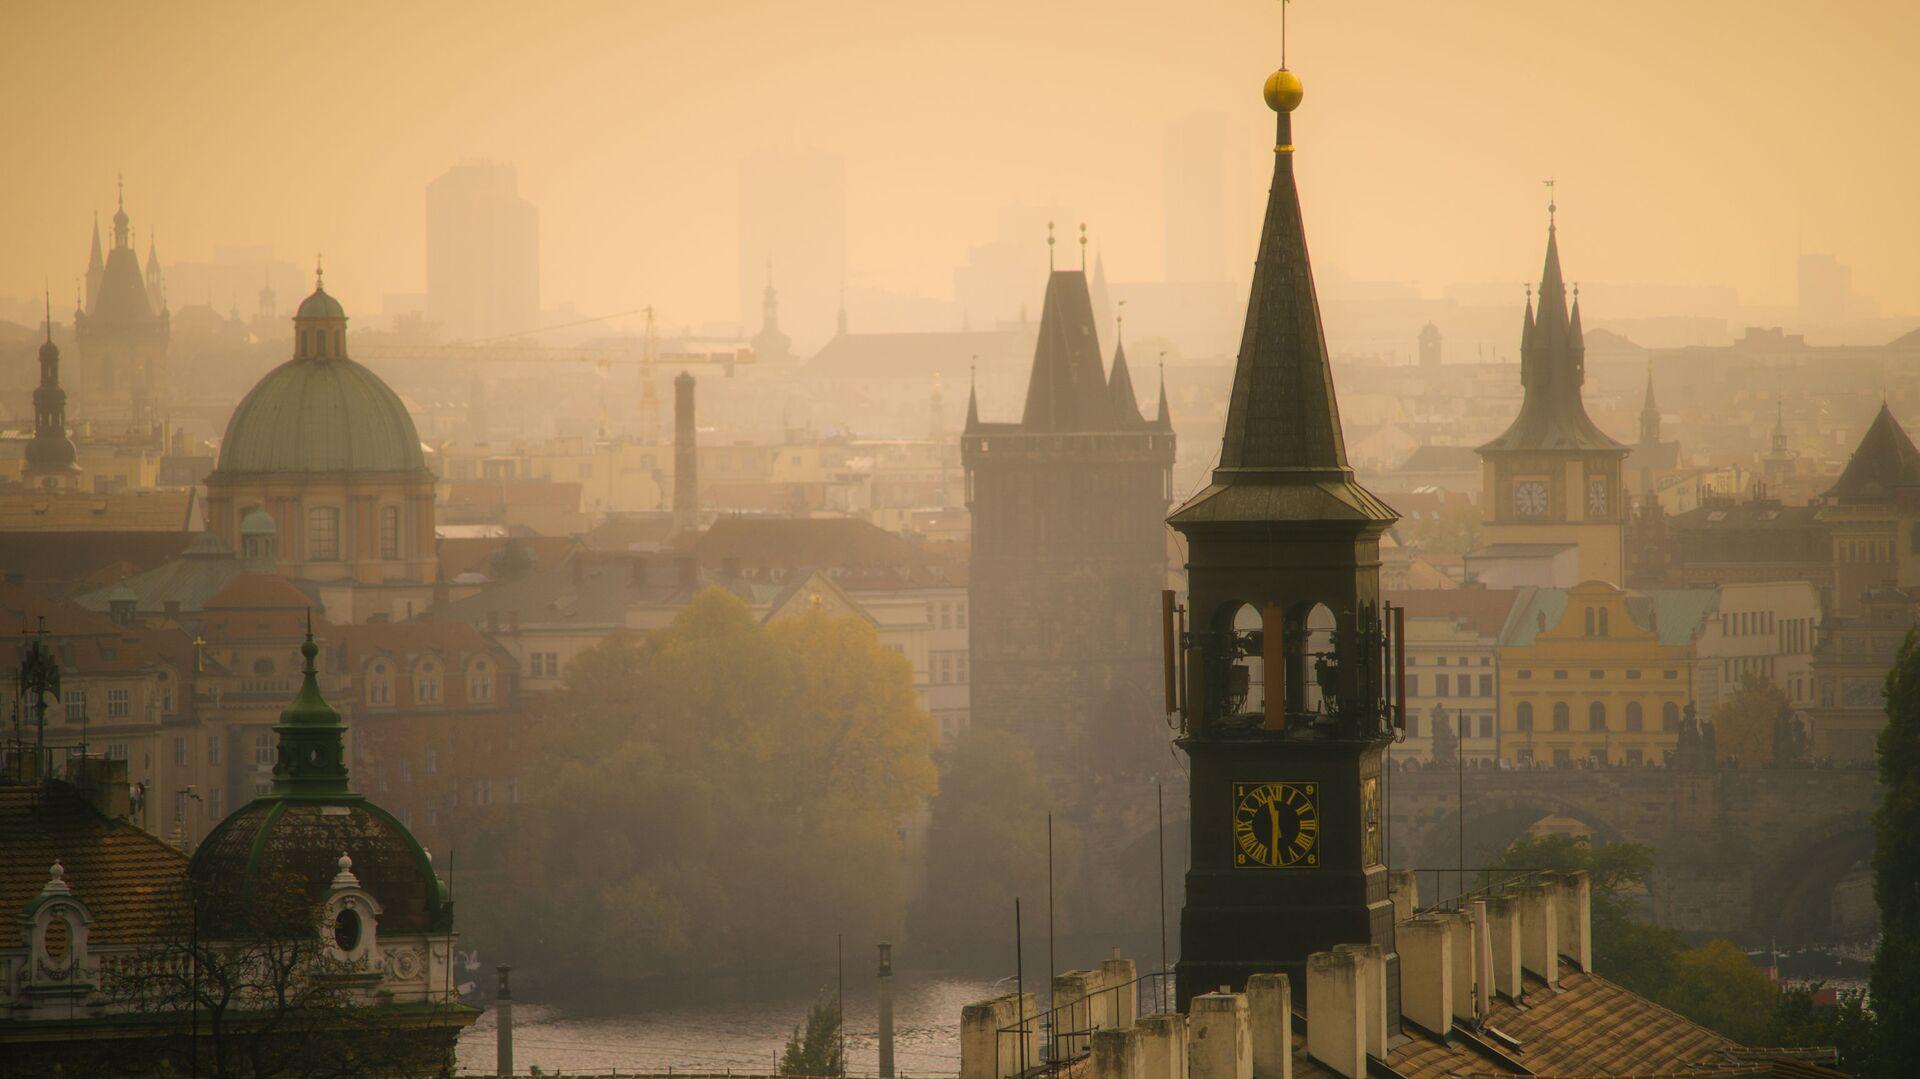 Praha - Sputnik Česká republika, 1920, 02.07.2021